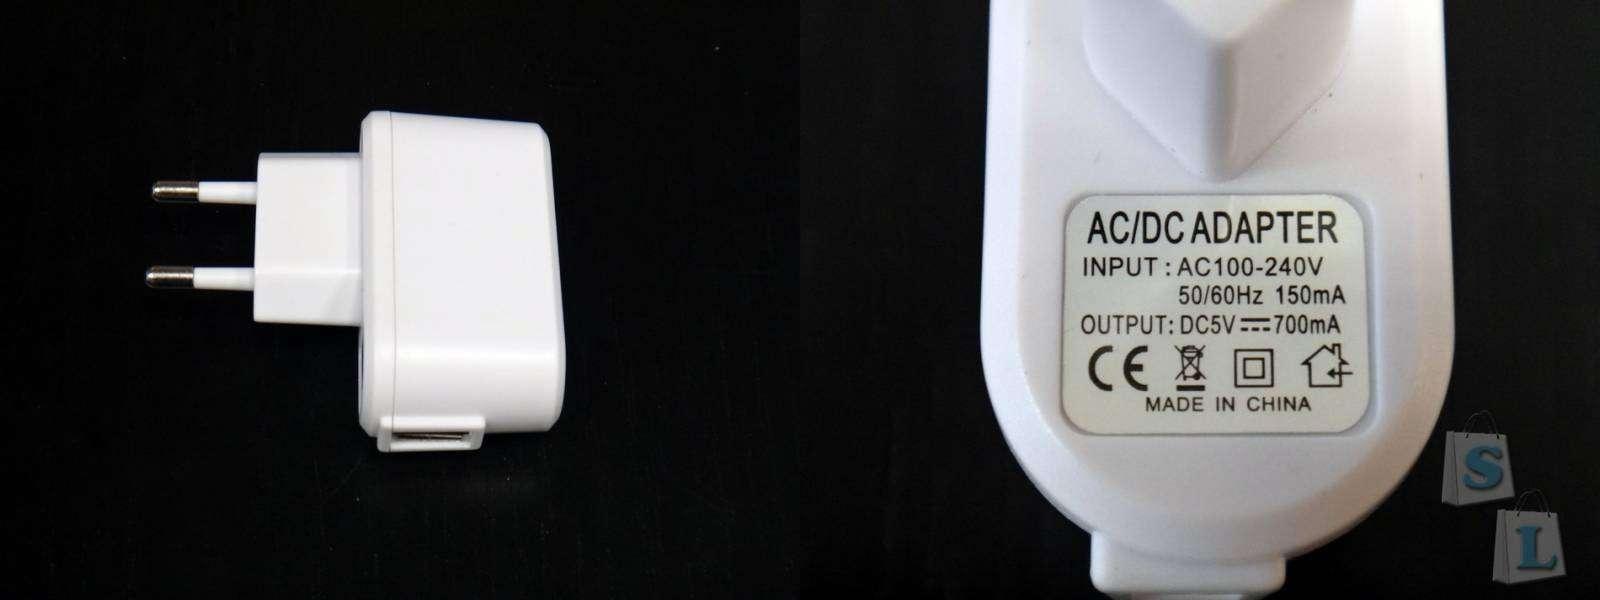 GearBest: Bluboo XFire бюджетный смартфон с очень живучей батареей